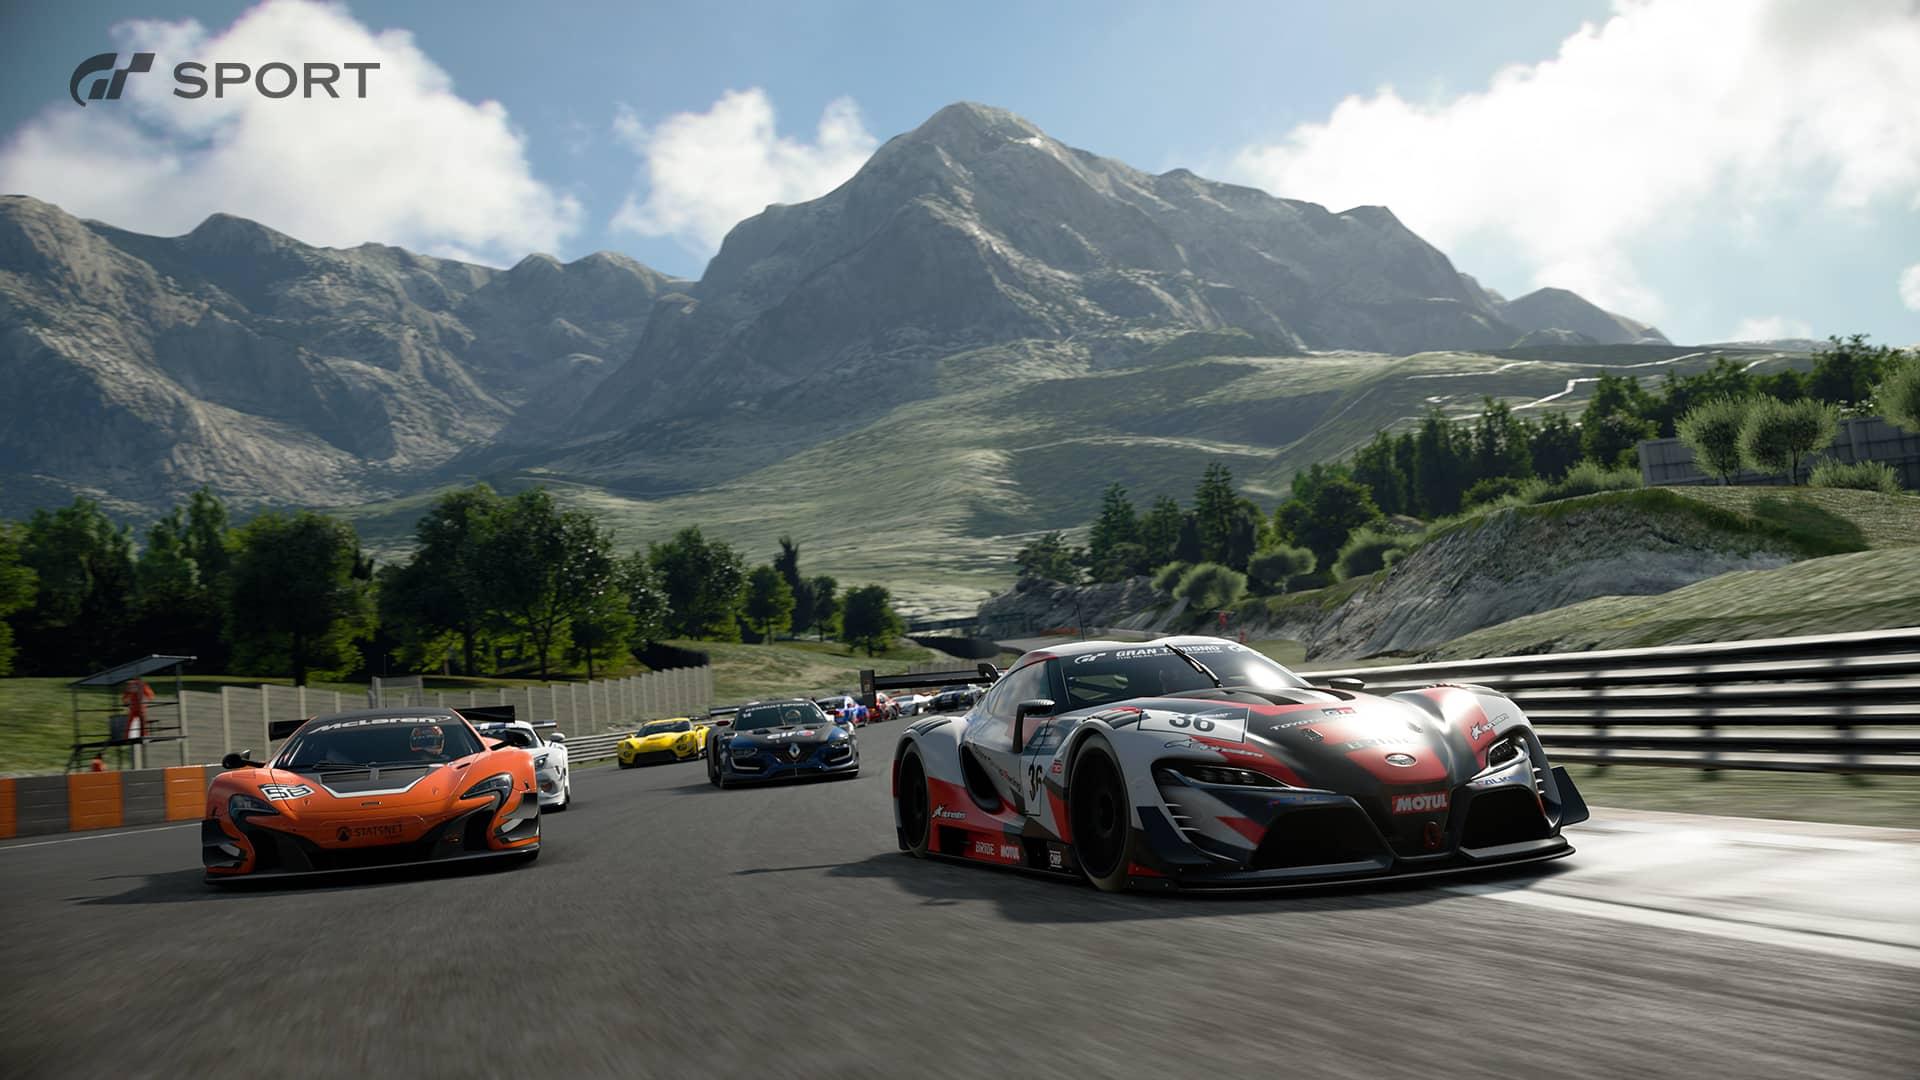 Gran Turismo 7 PS5 Leak Uses 'Mock Logo' Circulated Online, Says Source - Push Square